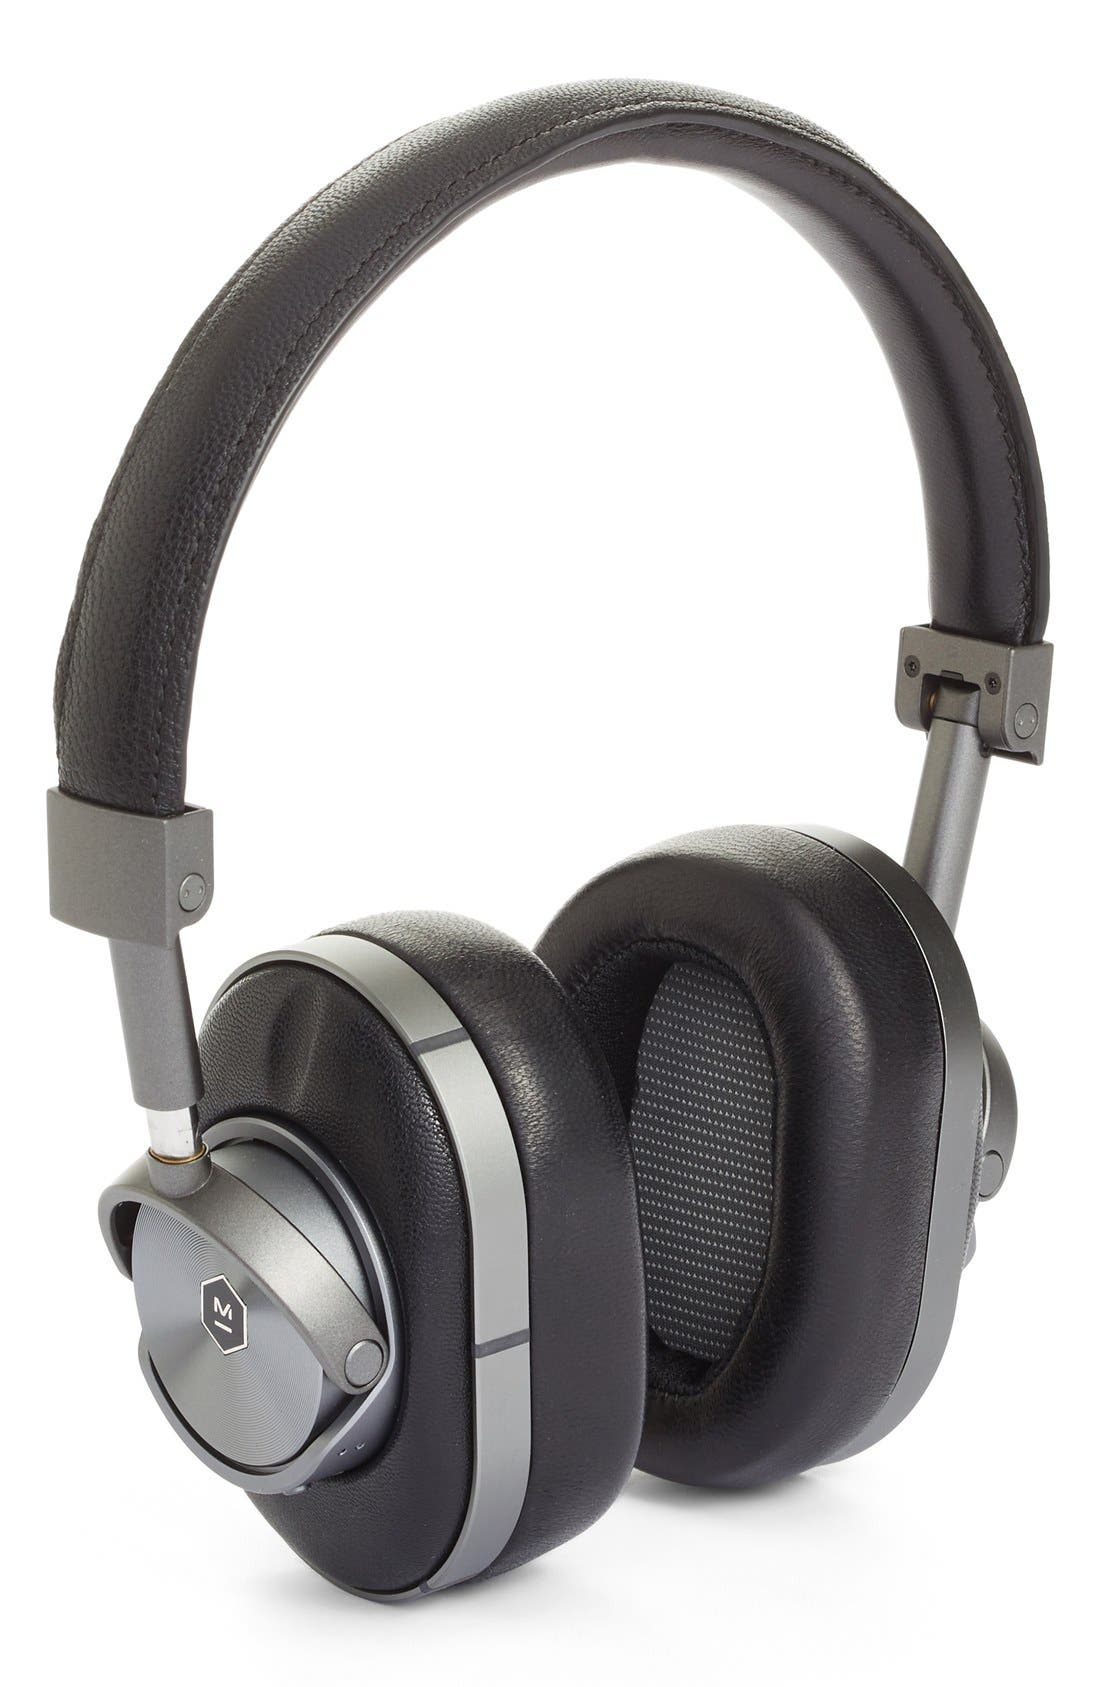 MW60 Wireless Leather Over Ear Headphones,                             Main thumbnail 1, color,                             BLACK/ GUNMETAL